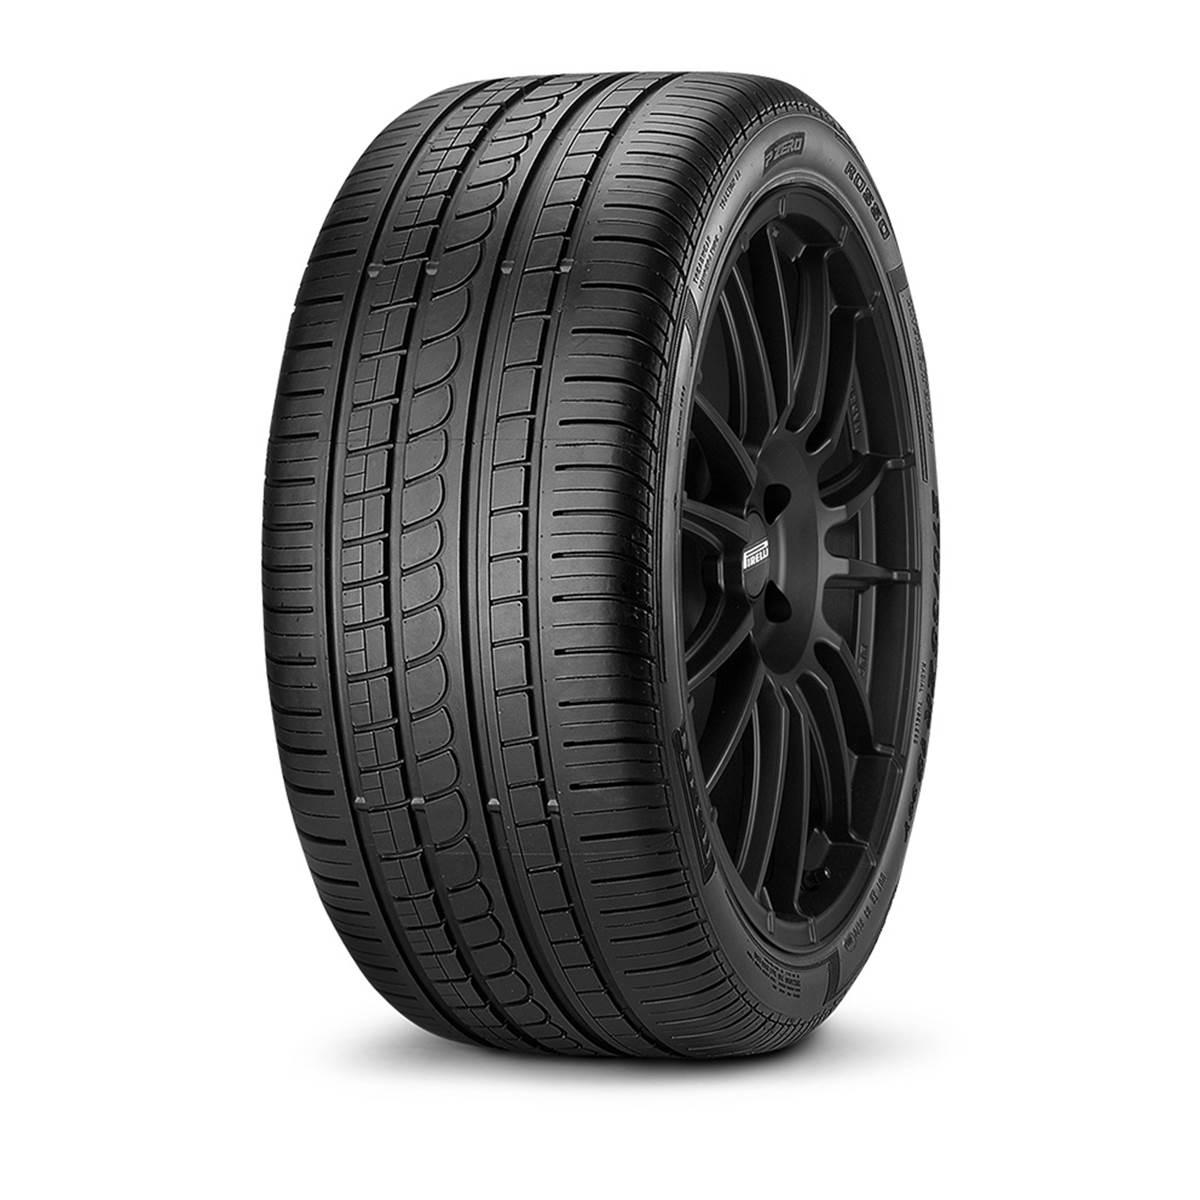 Pneu Pirelli 225/35R18 87Y Pzero Nero (Gt) XL